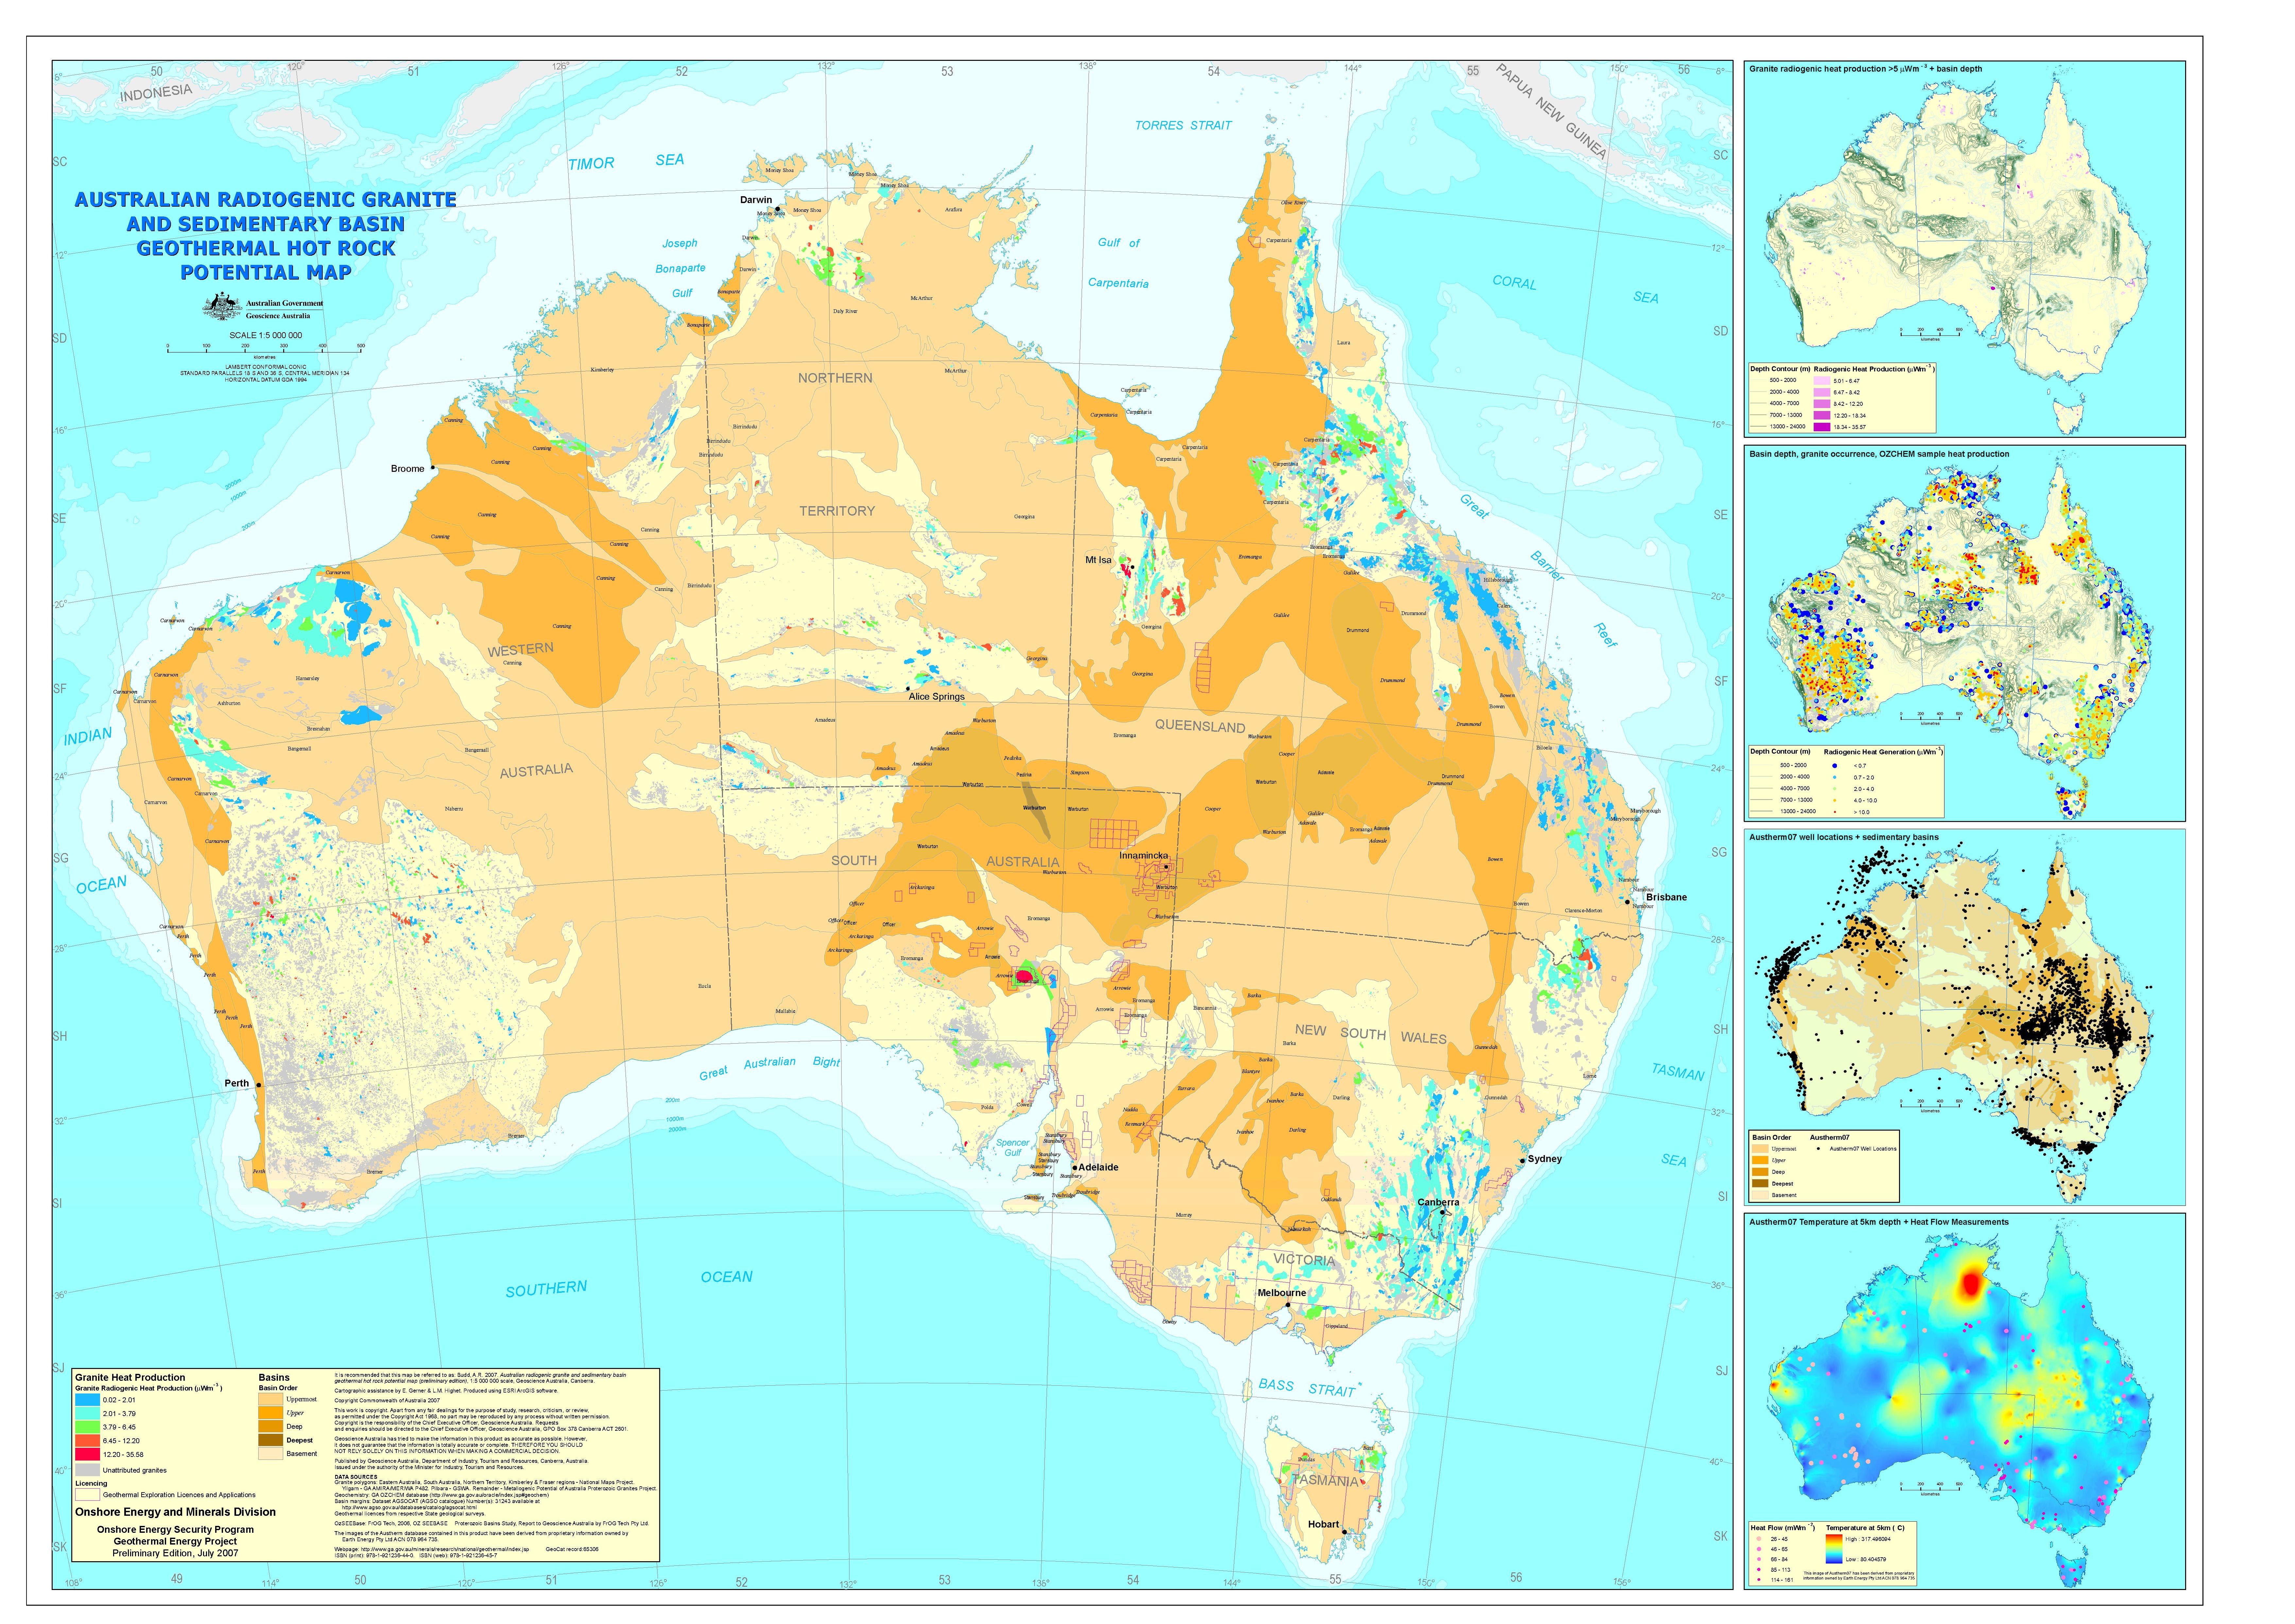 Geothermal Energy Plant Locations geothermal power in australia ...